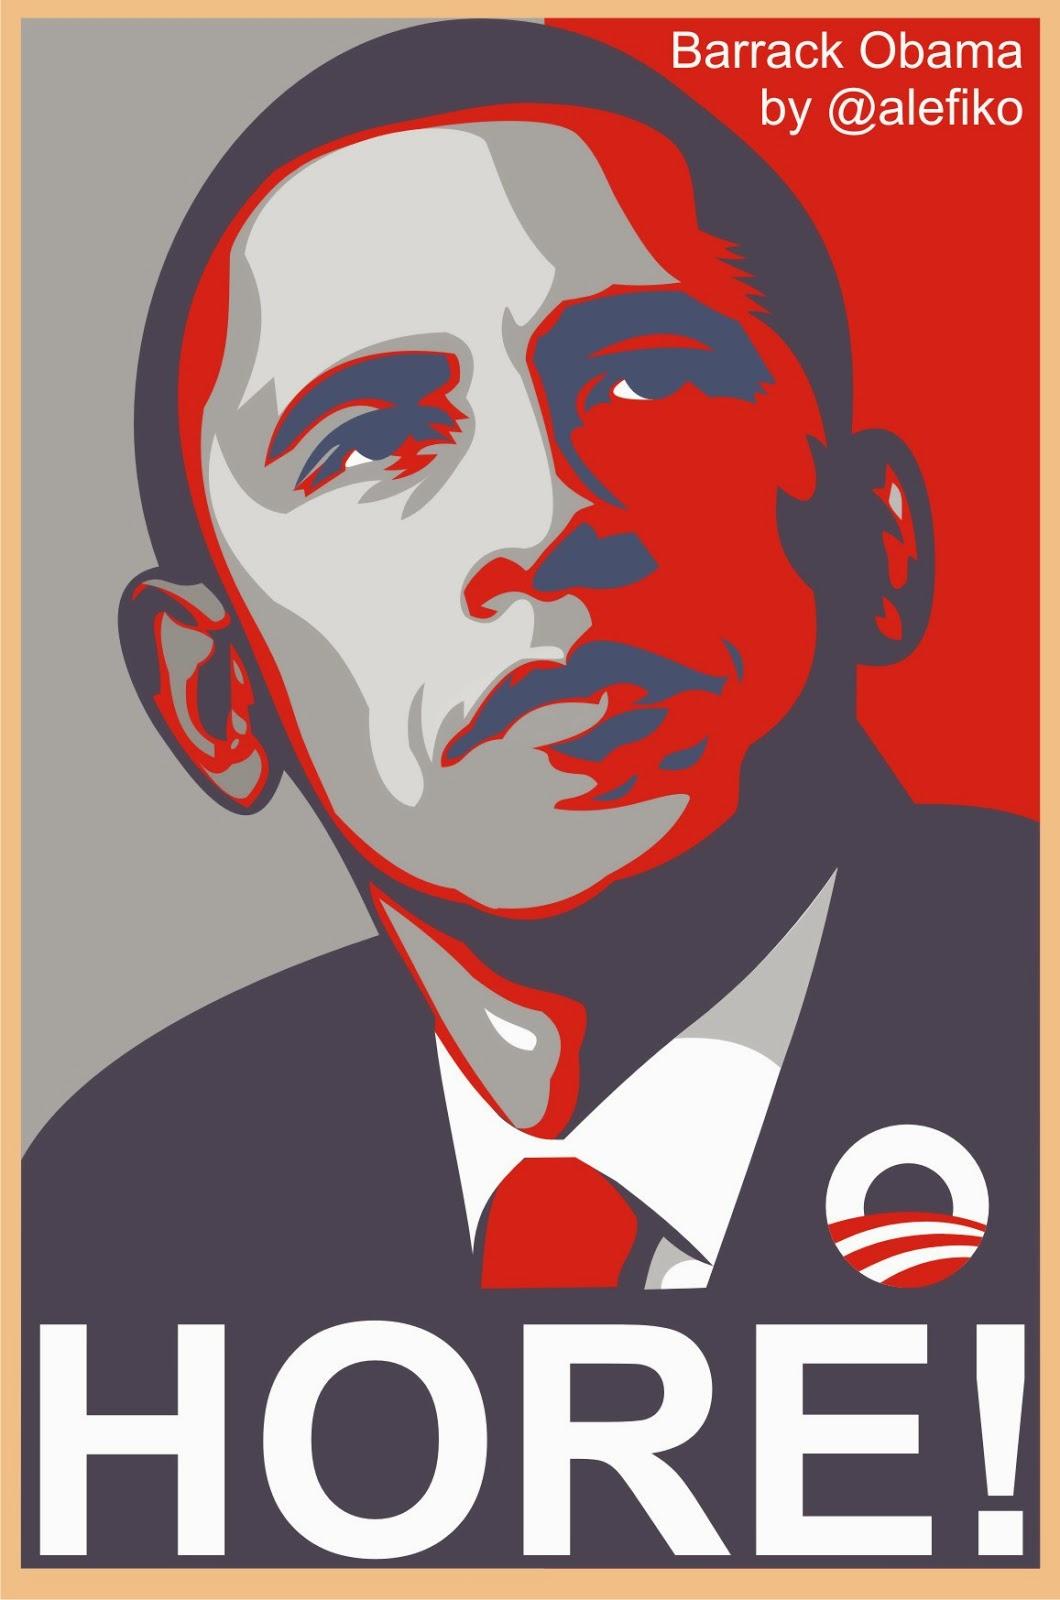 WPAP Barrack Obama